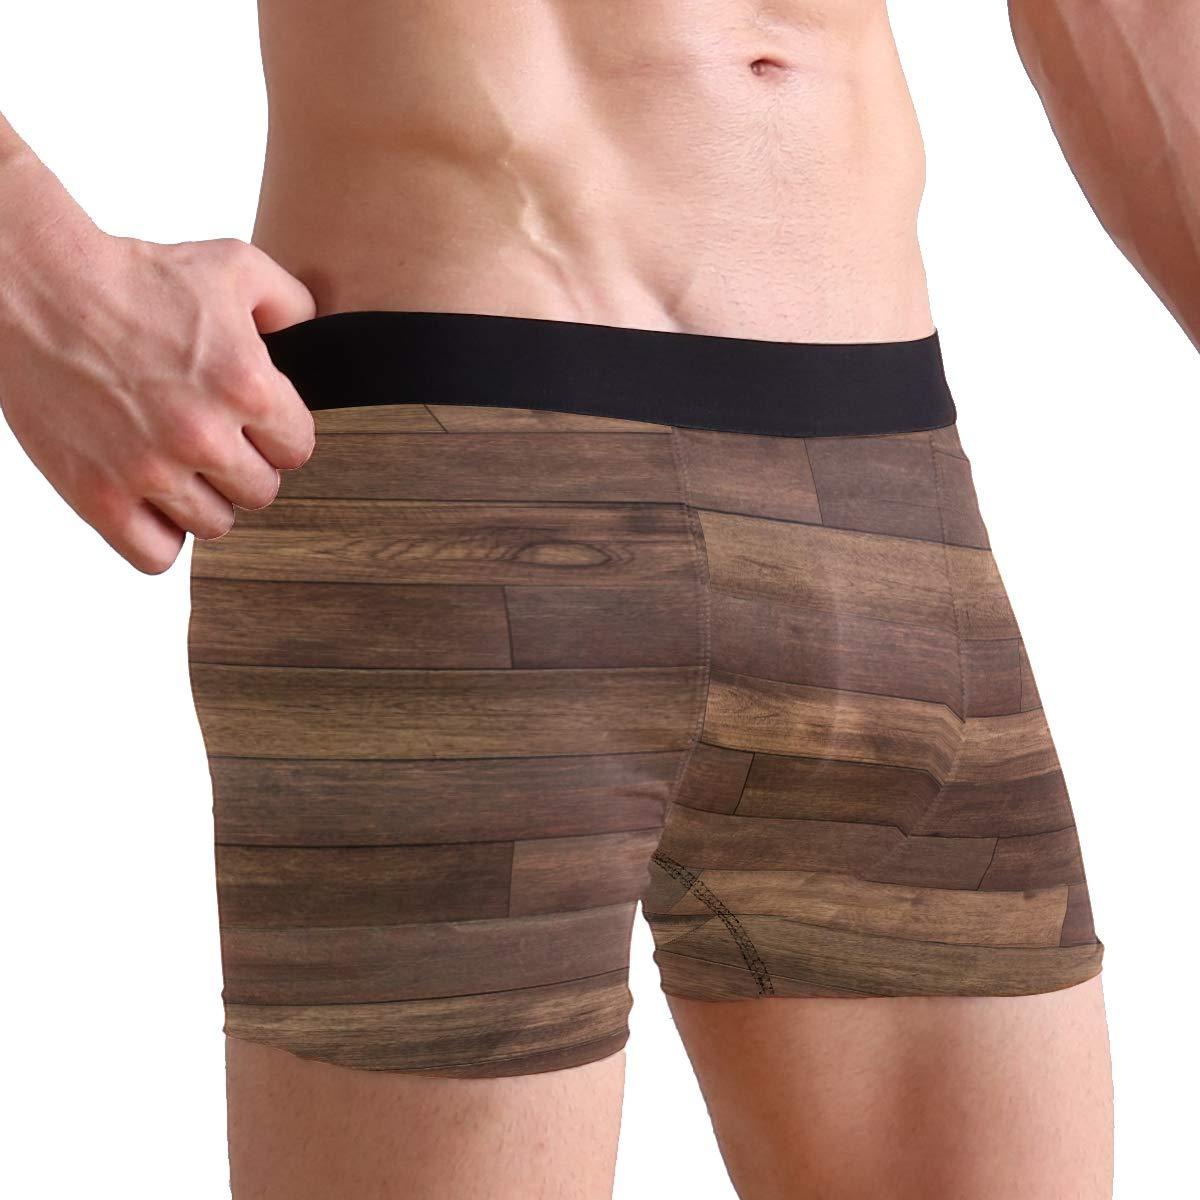 SUABO Mens 2-Pack Boxer Briefs Polyester Underwear Trunk Underwear with Wood Design